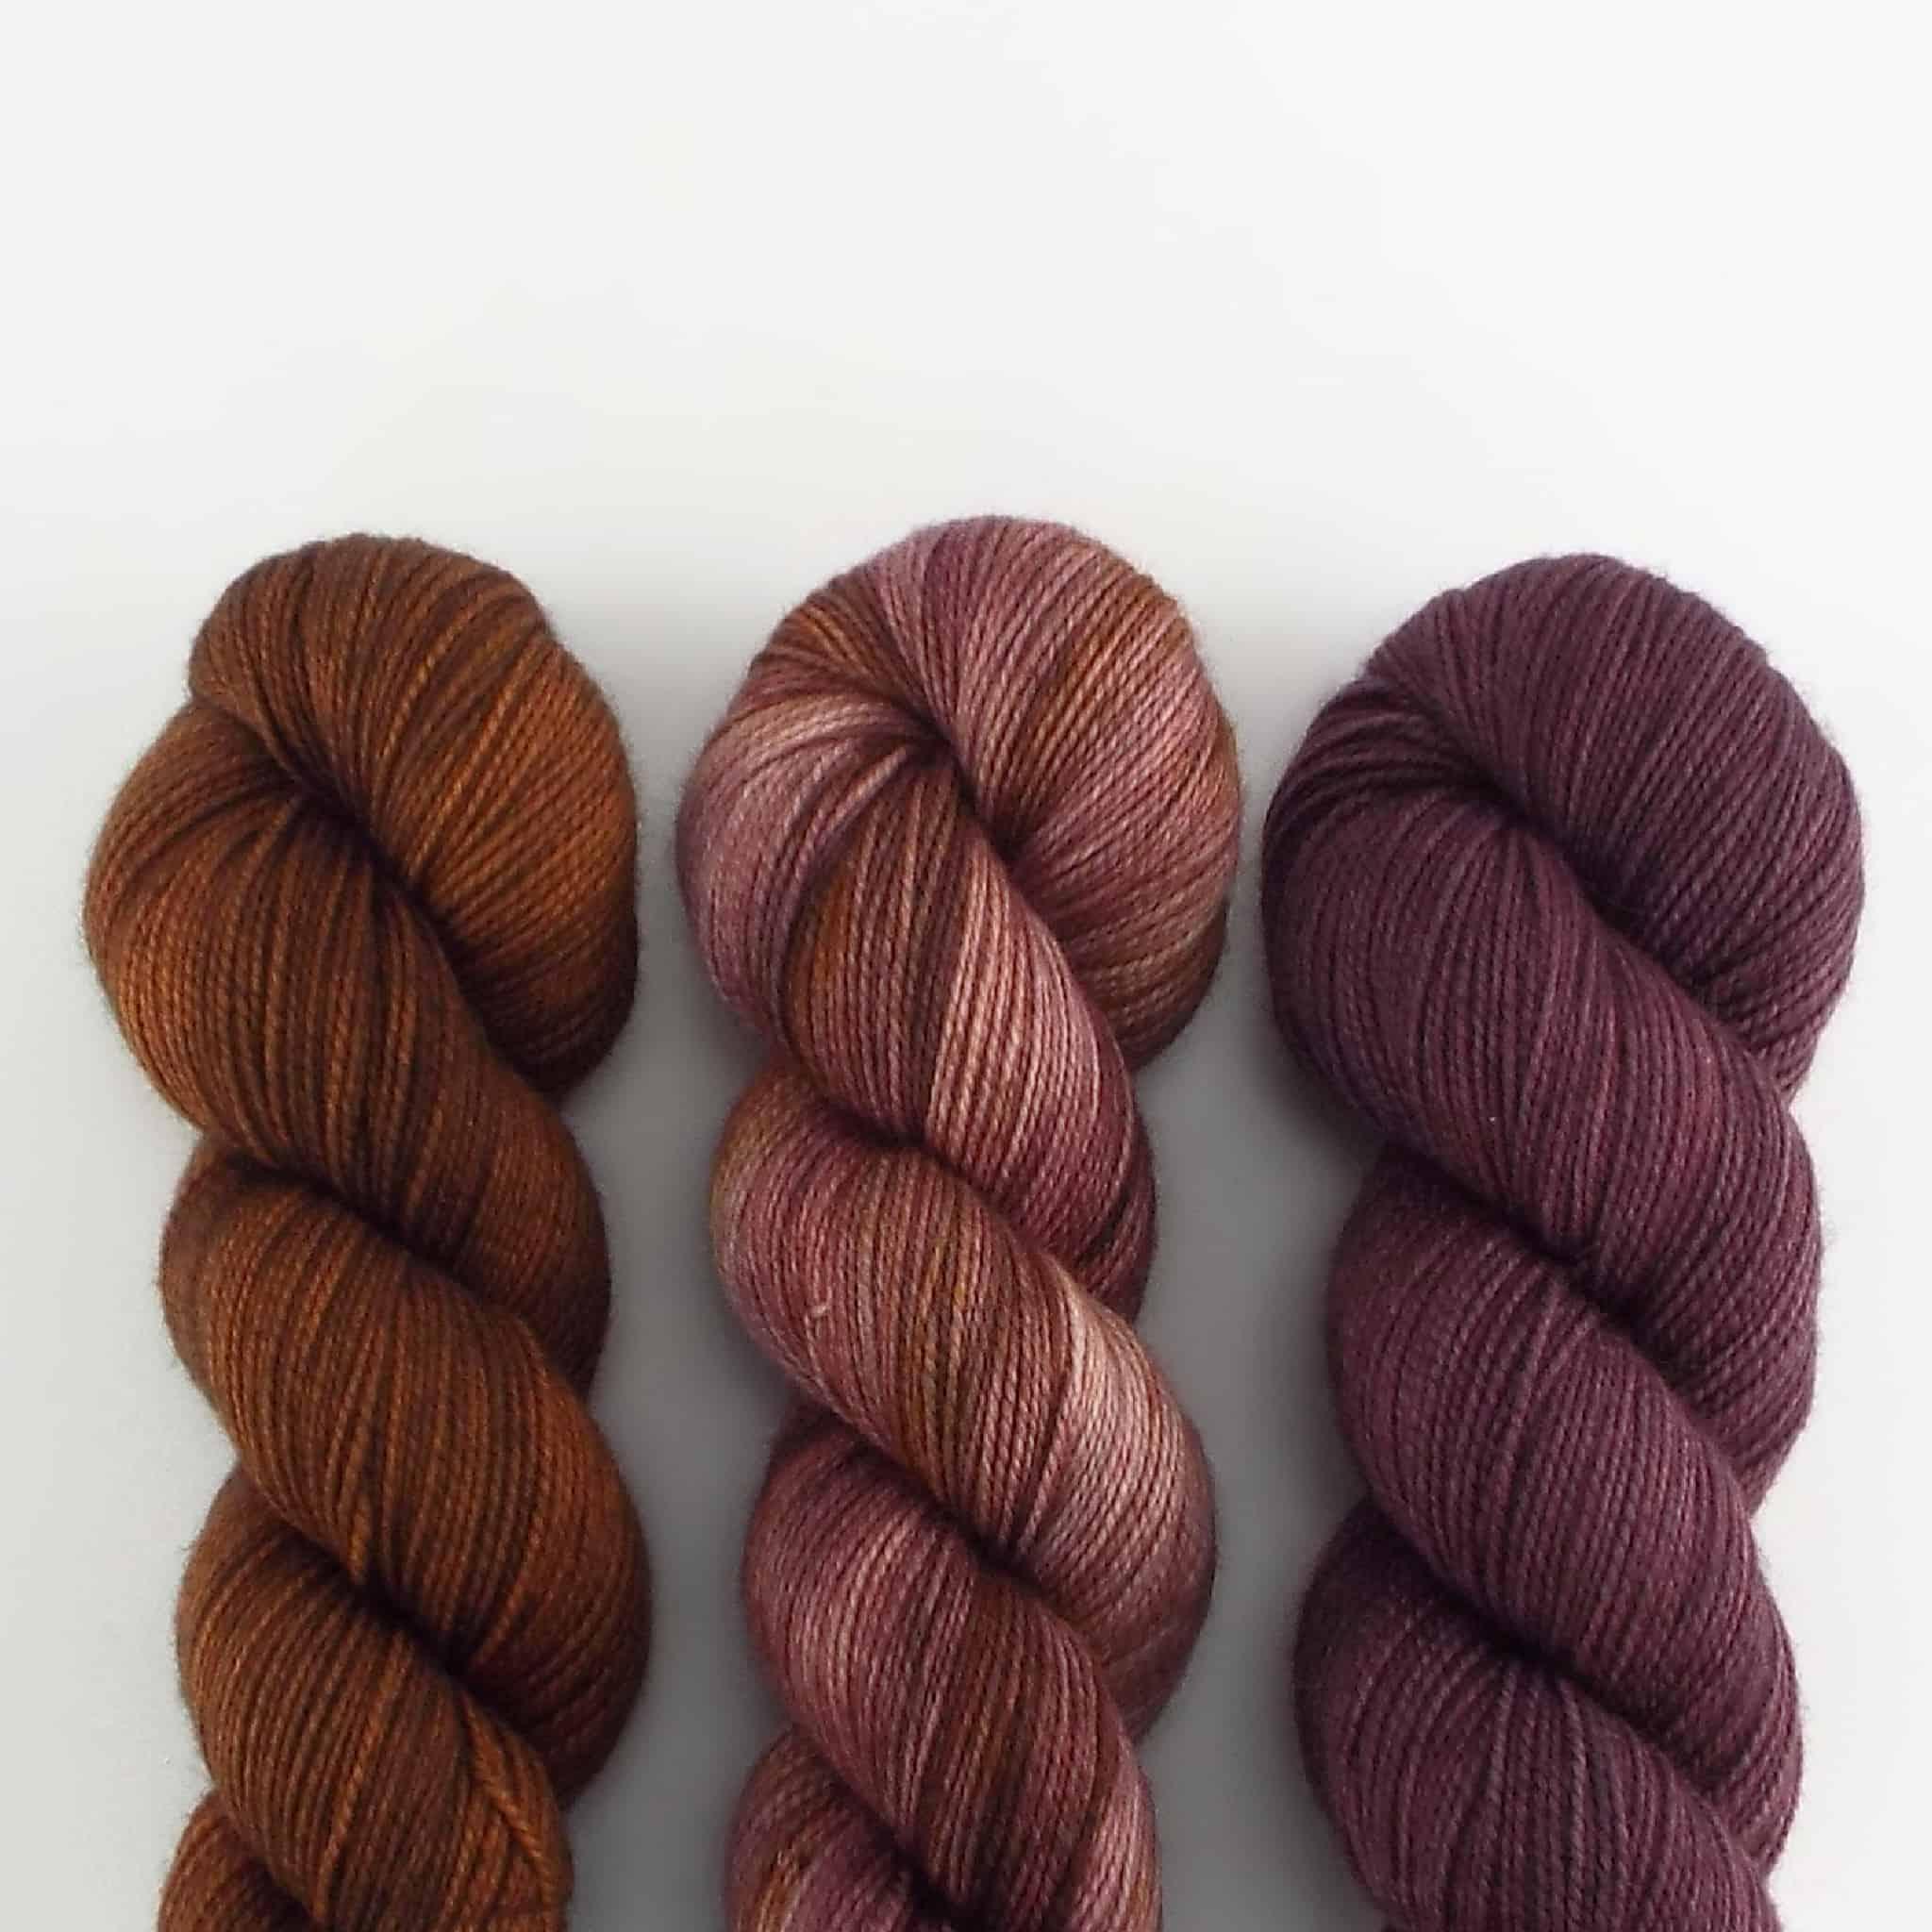 Three skeins of plum yarn.